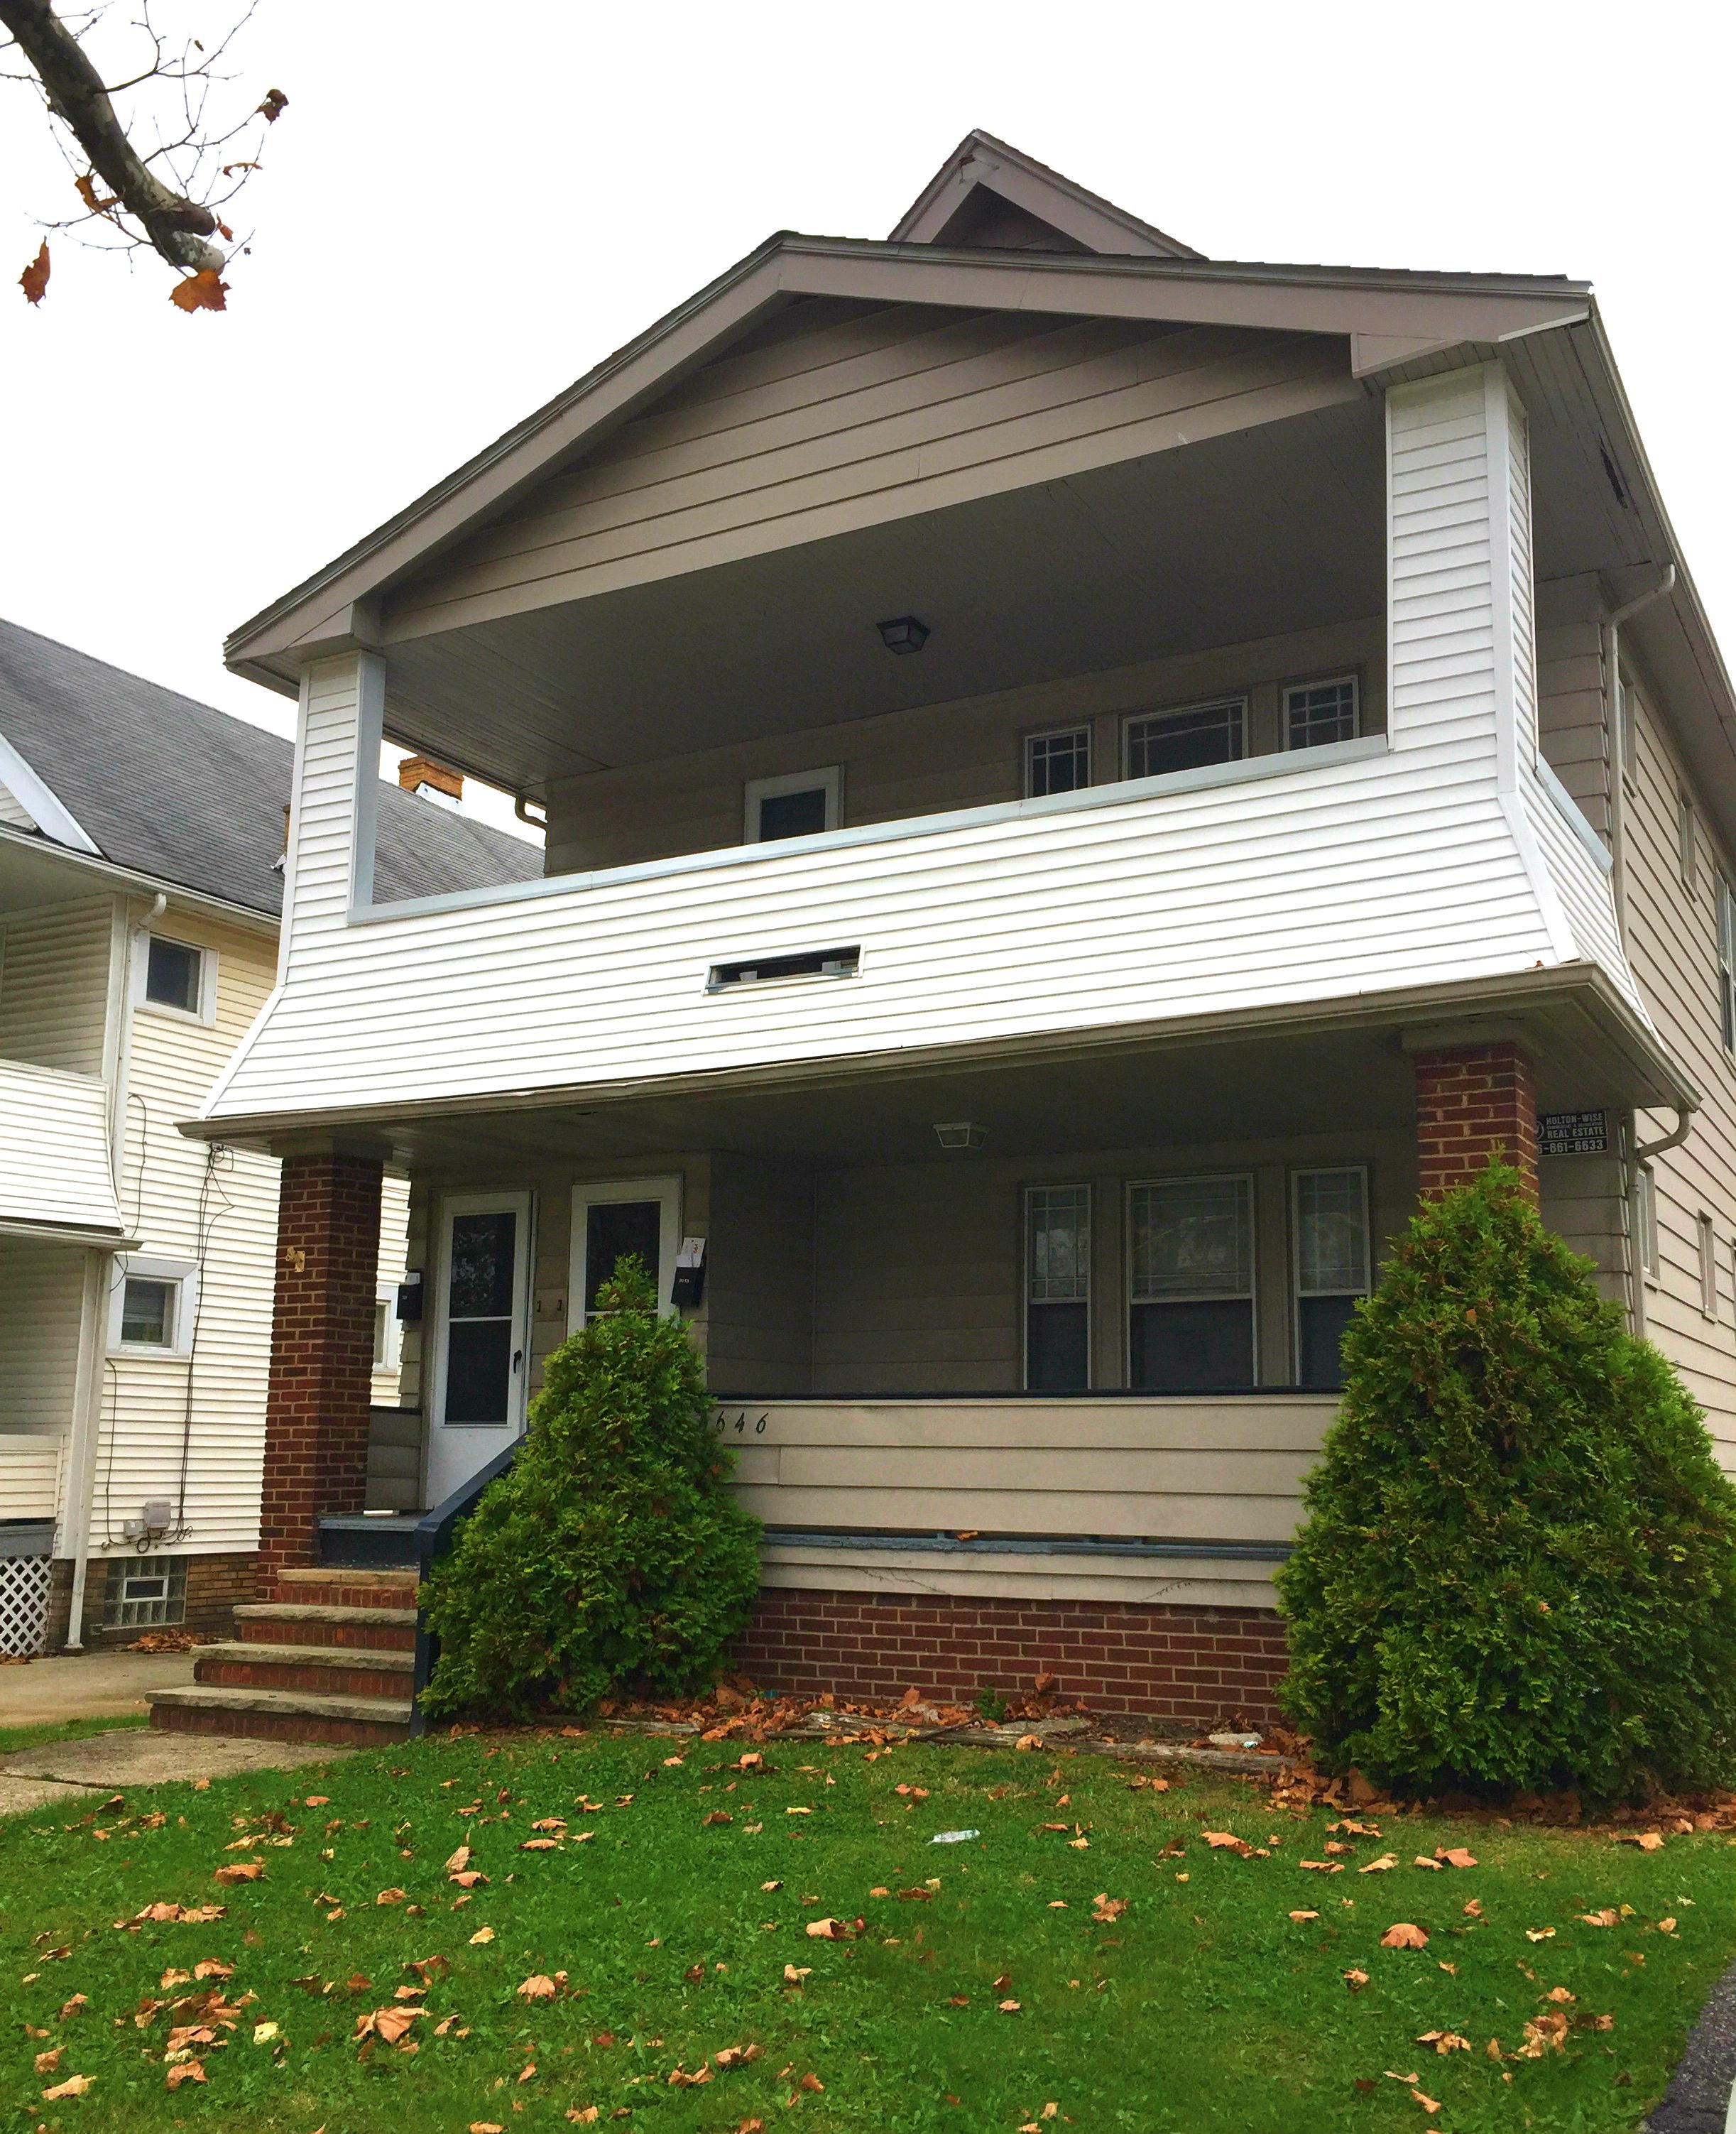 4646 Blythin Rd., Garfield Hts. | 4 bed 2 bath | 2,048 Sq. Ft. | $60,000